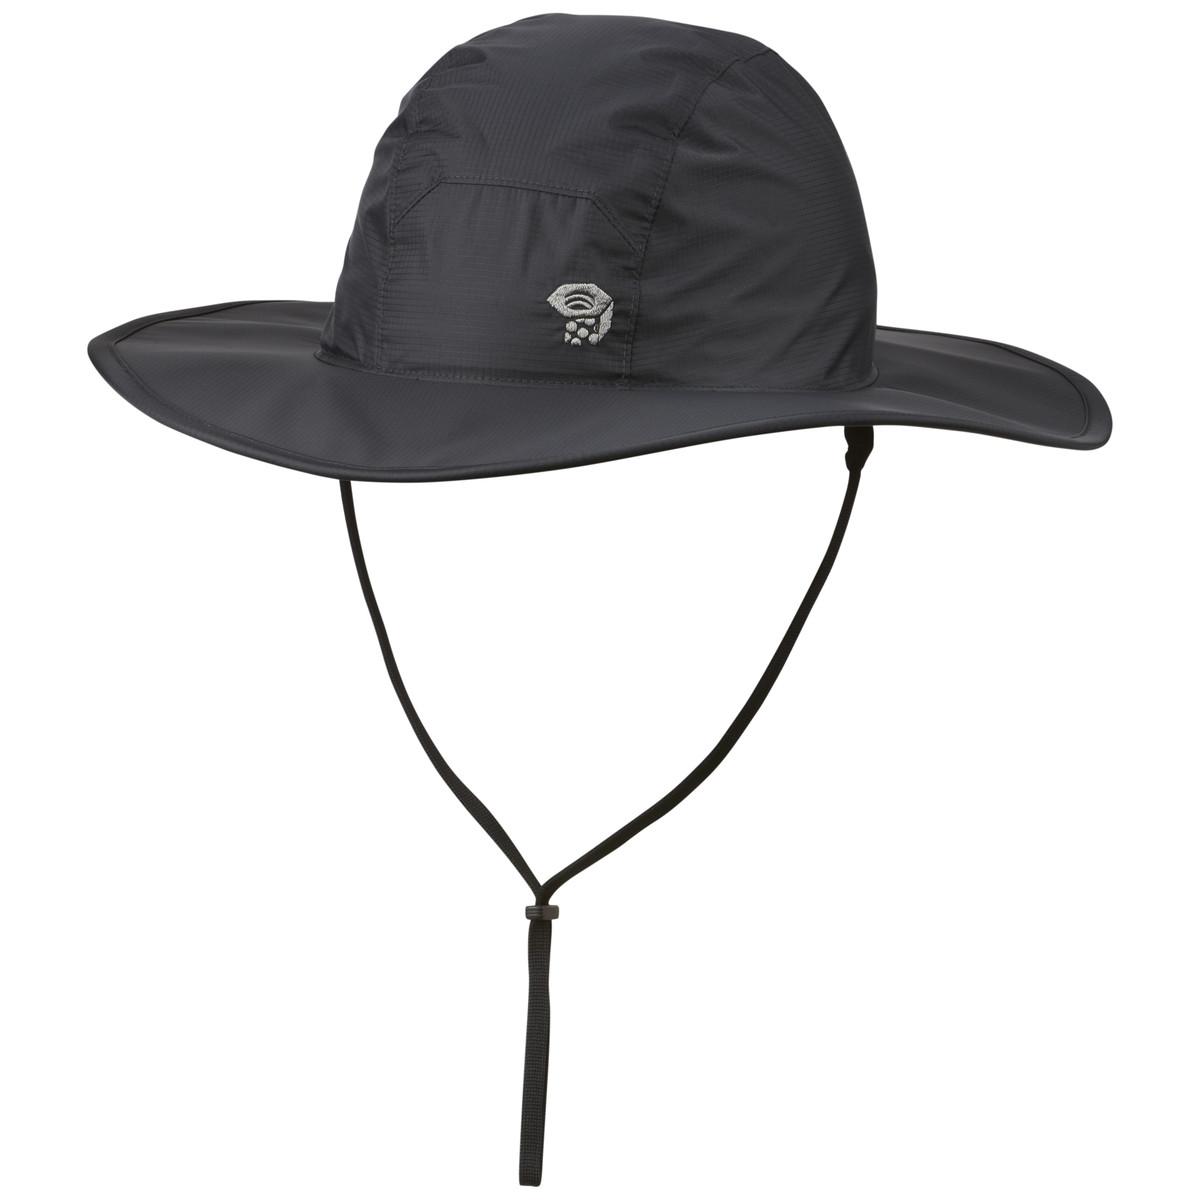 Mountain Hardwear Plasmic EVAP Wide Brim Hat